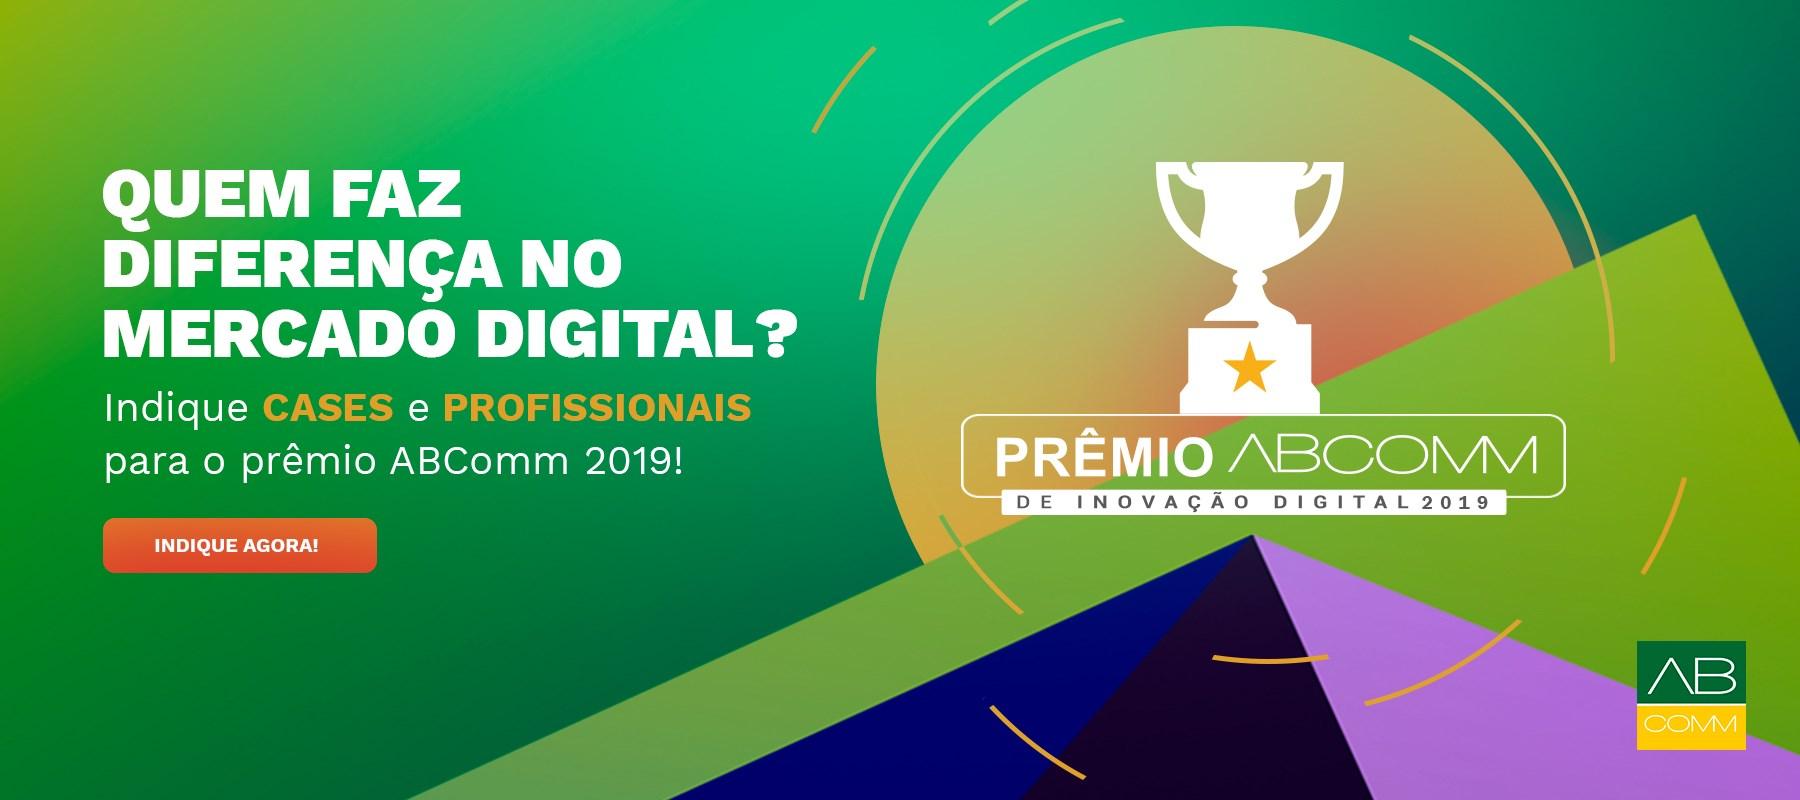 premio-abcomm-2019-indicacoes-2